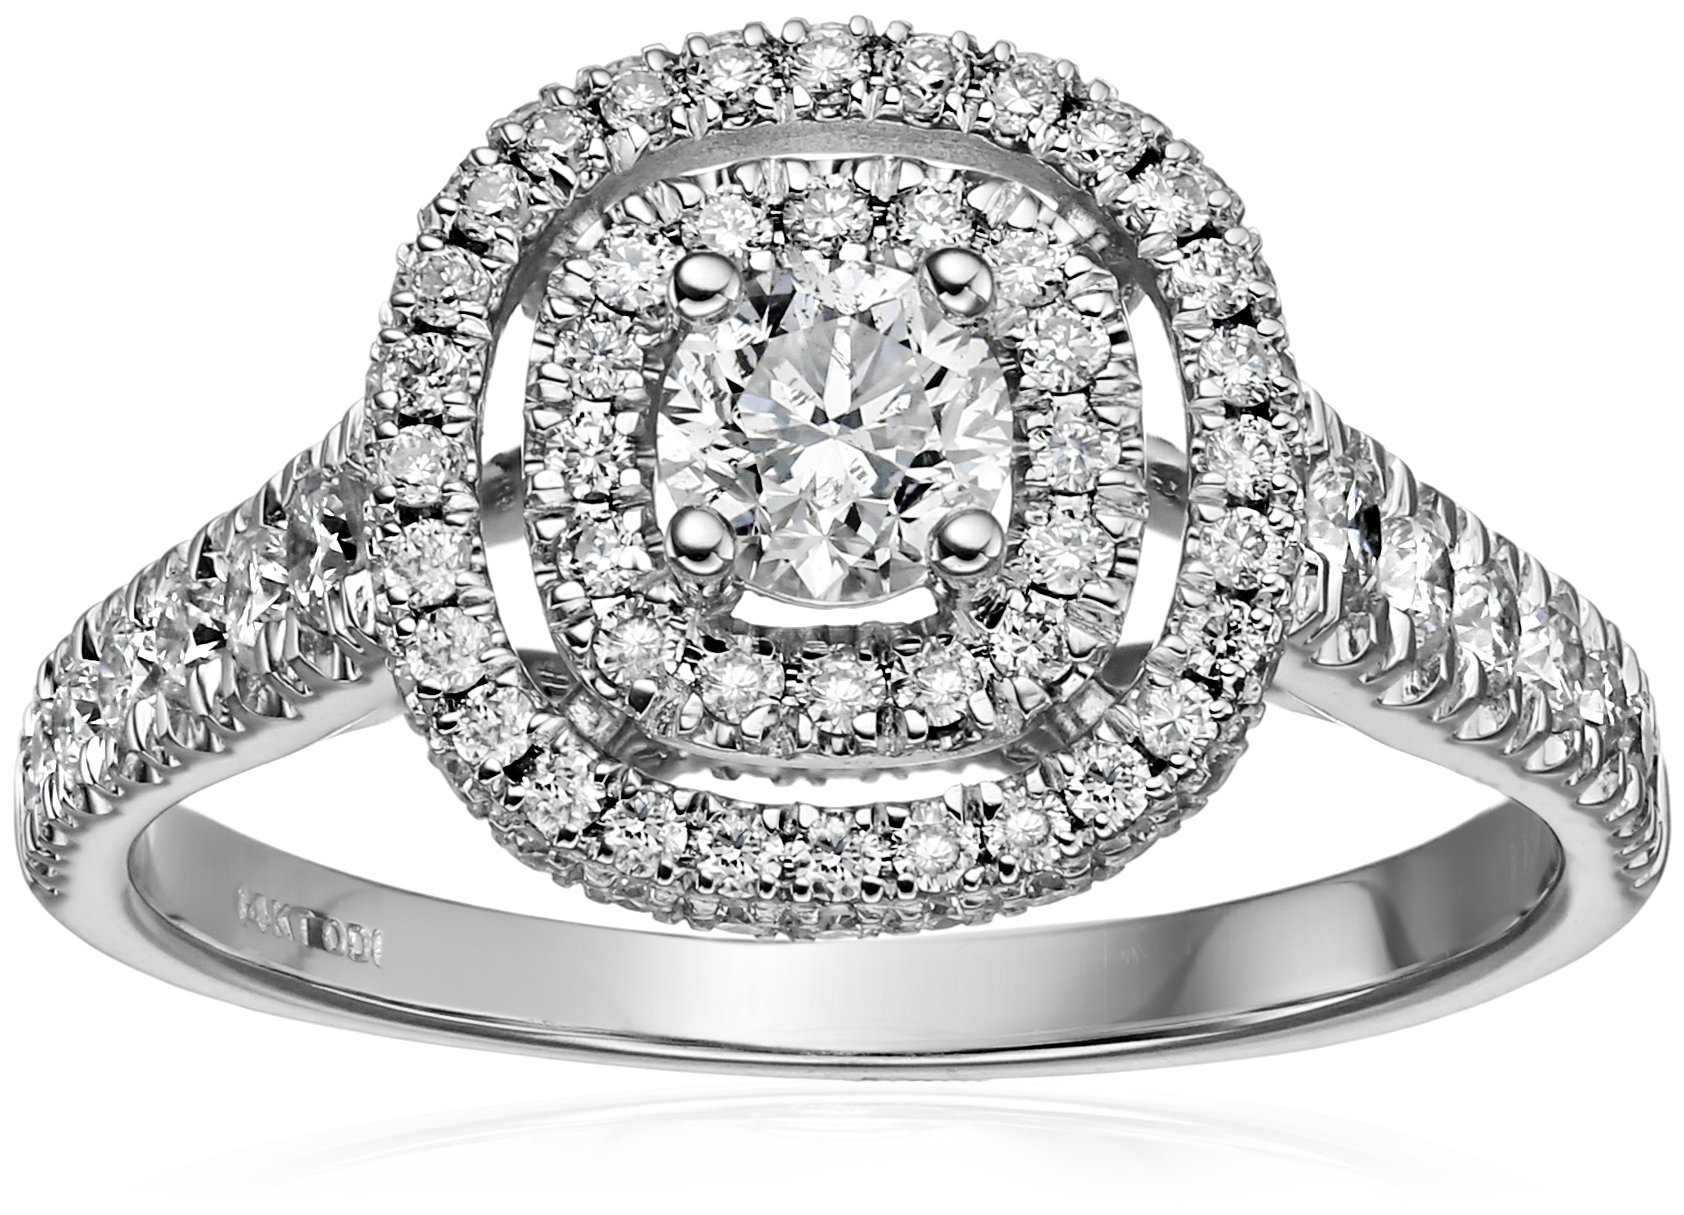 IGI Certified 14k White Gold Diamond Double Halo Engagement Ring (1 1/4 cttw, H-I Color, I1-I2 Clarity), Size 7